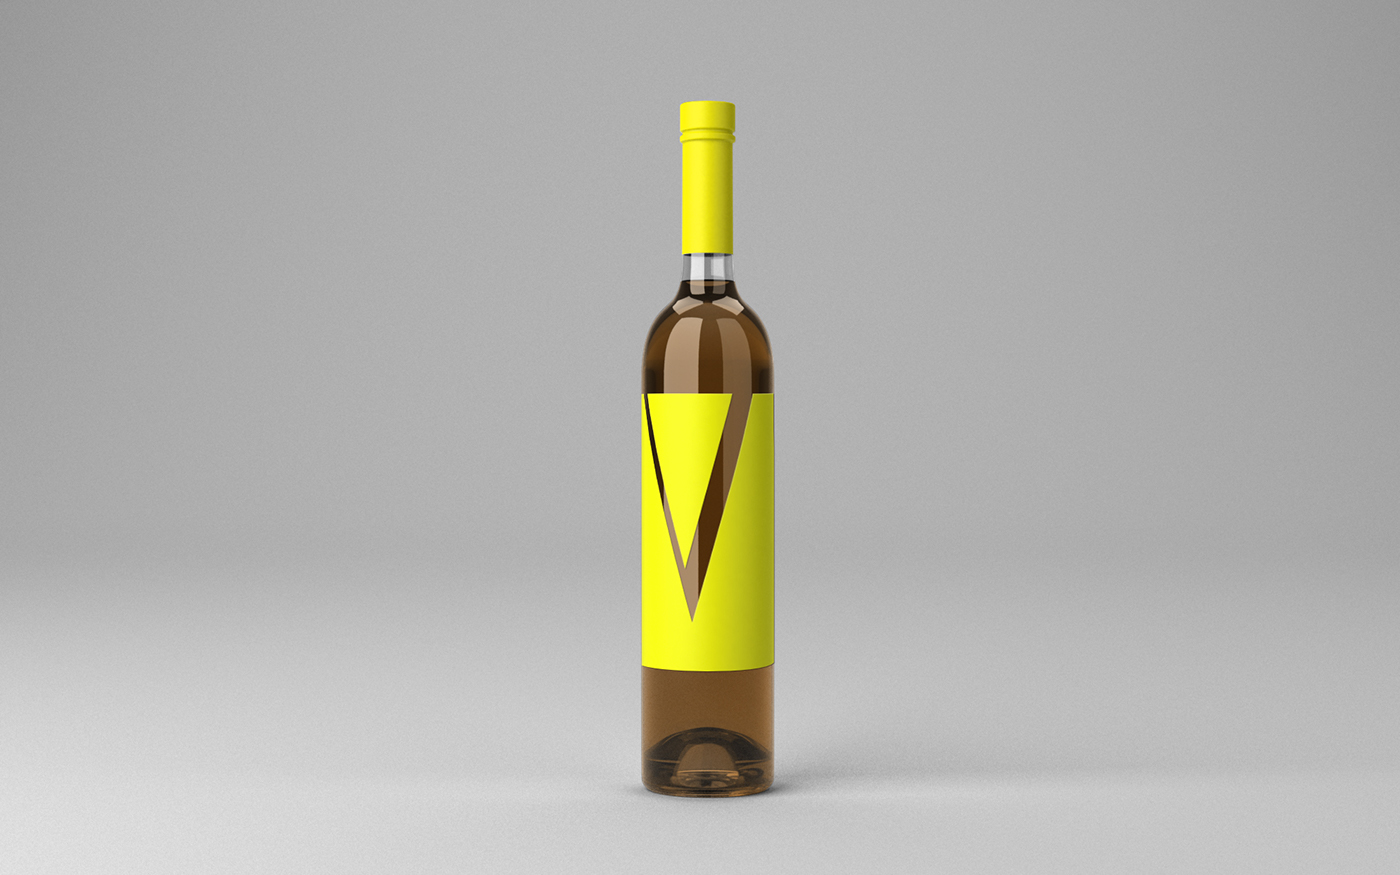 wine bottle mock-up mock up Mockup free freebie